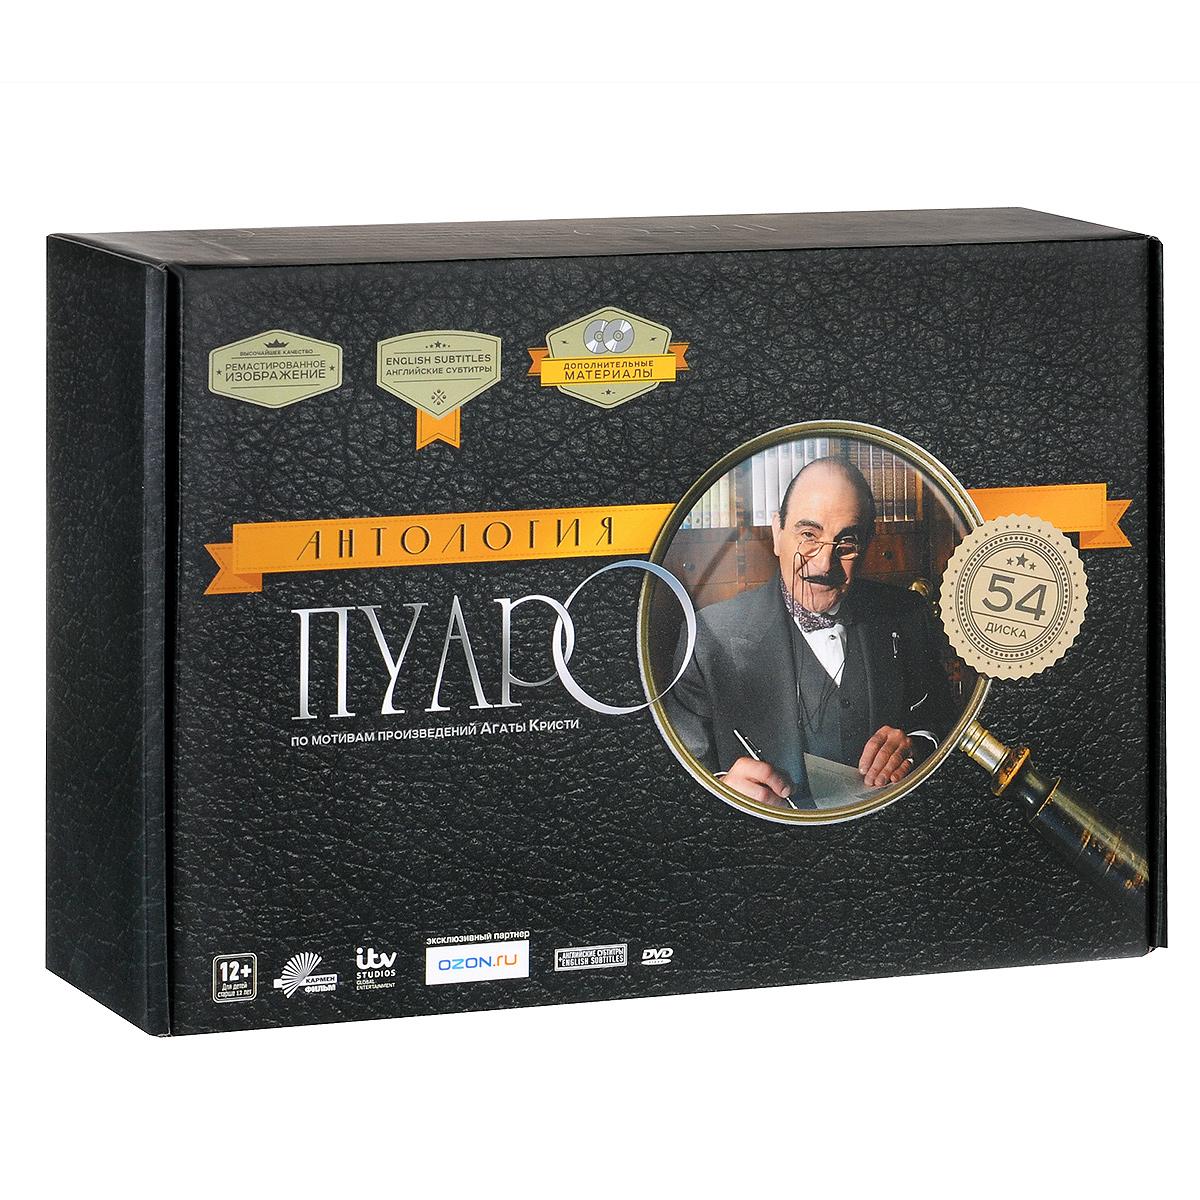 Пуаро: Полная коллекция (54 DVD) видеодиски нд плэй экстрасенсы dvd video dvd box